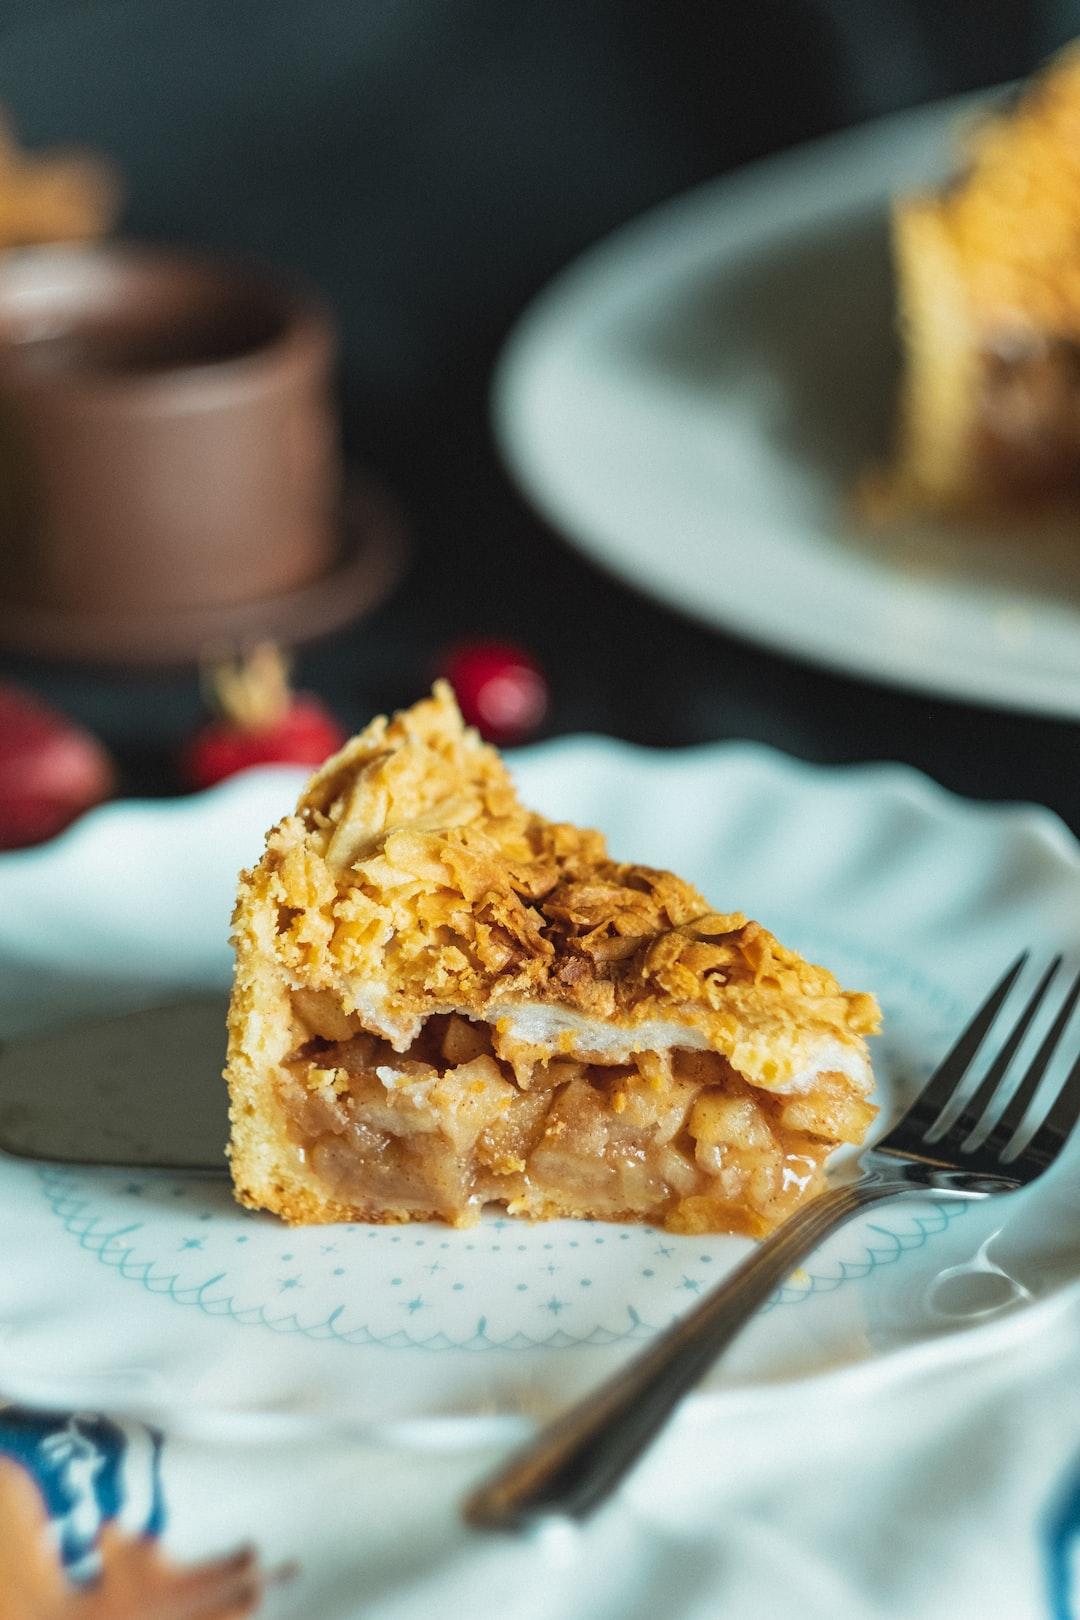 Yum! Apple Pie